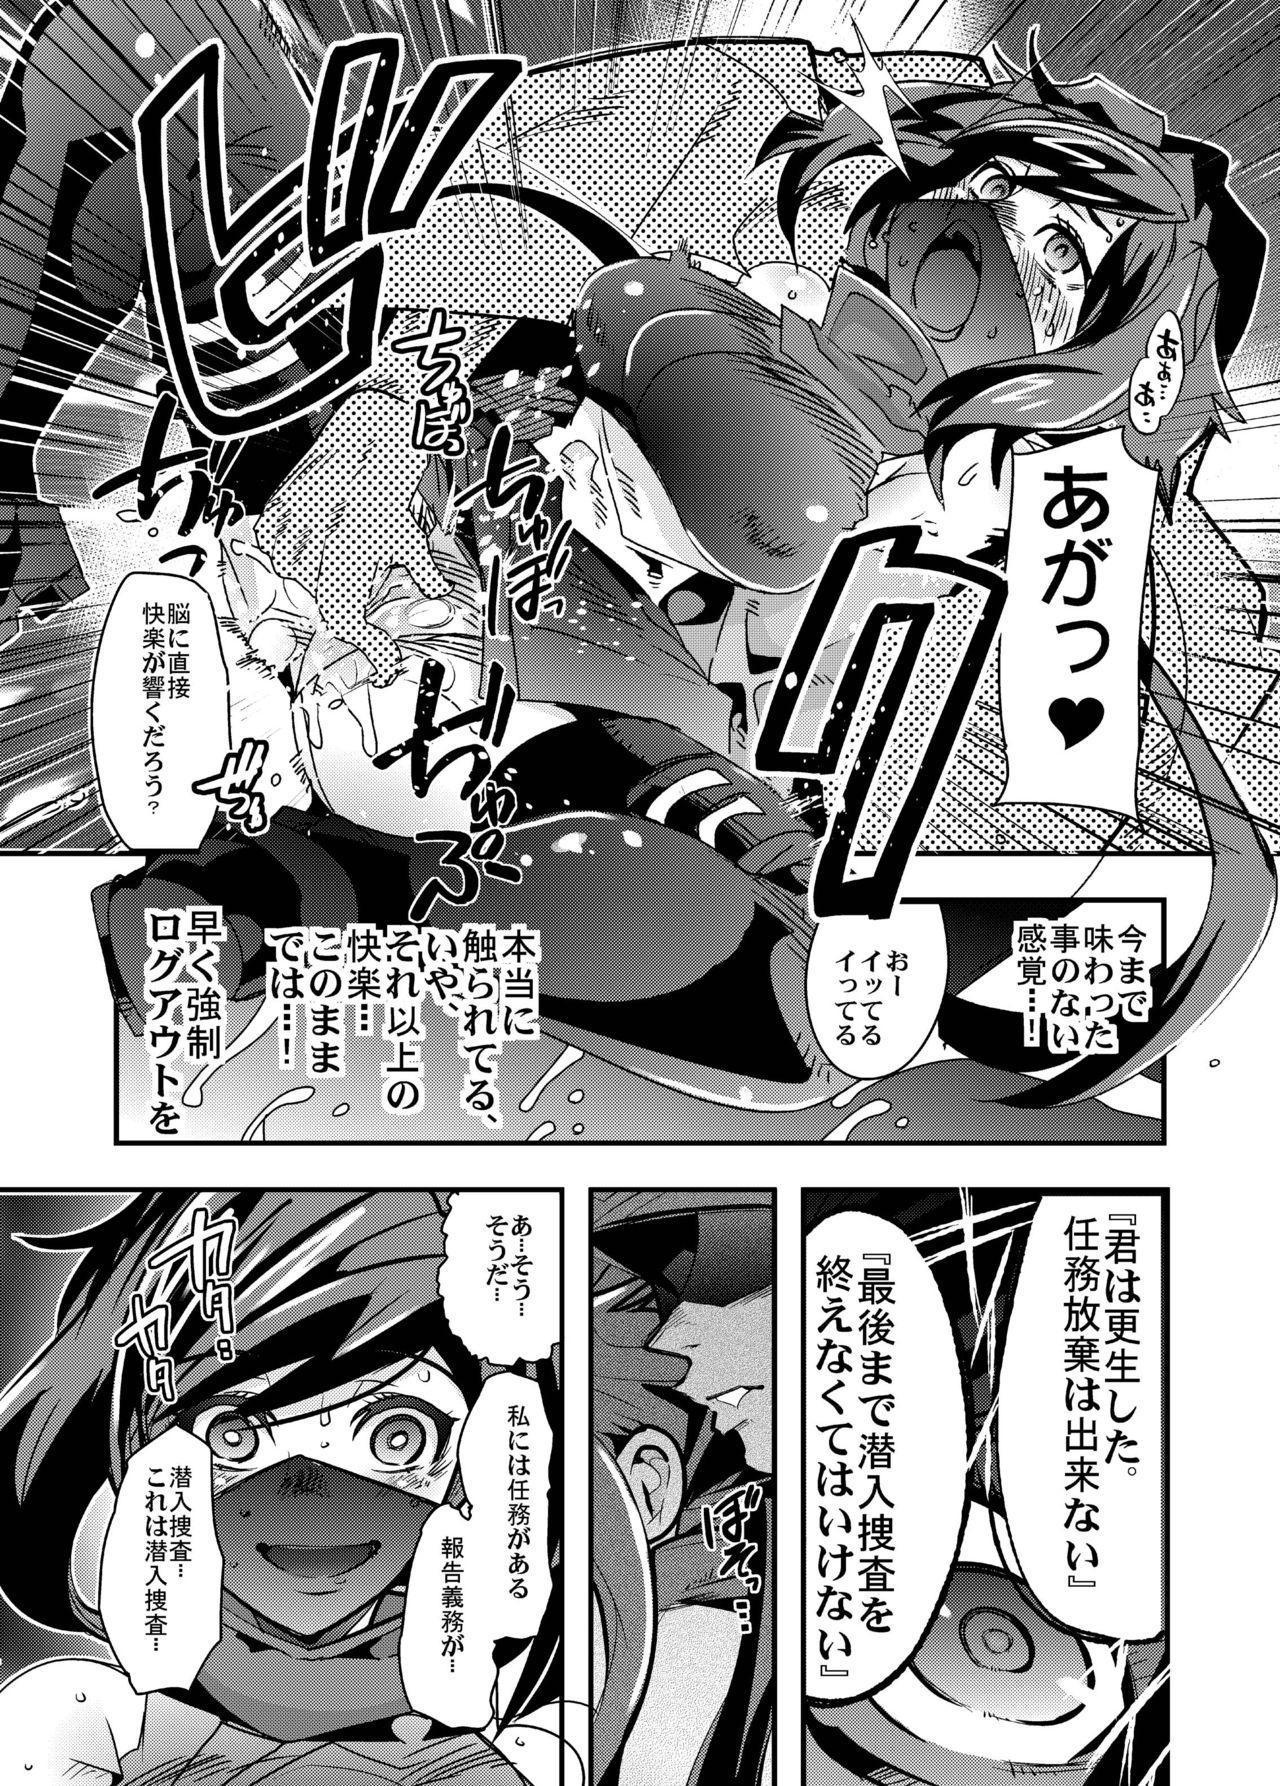 [Bronco Hitoritabi (Uchi-Uchi Keyaki)] Diver-nin Ayame to Ecchi na Mokeiya no Onee-san (Gundam Build Divers) [Digital] 6